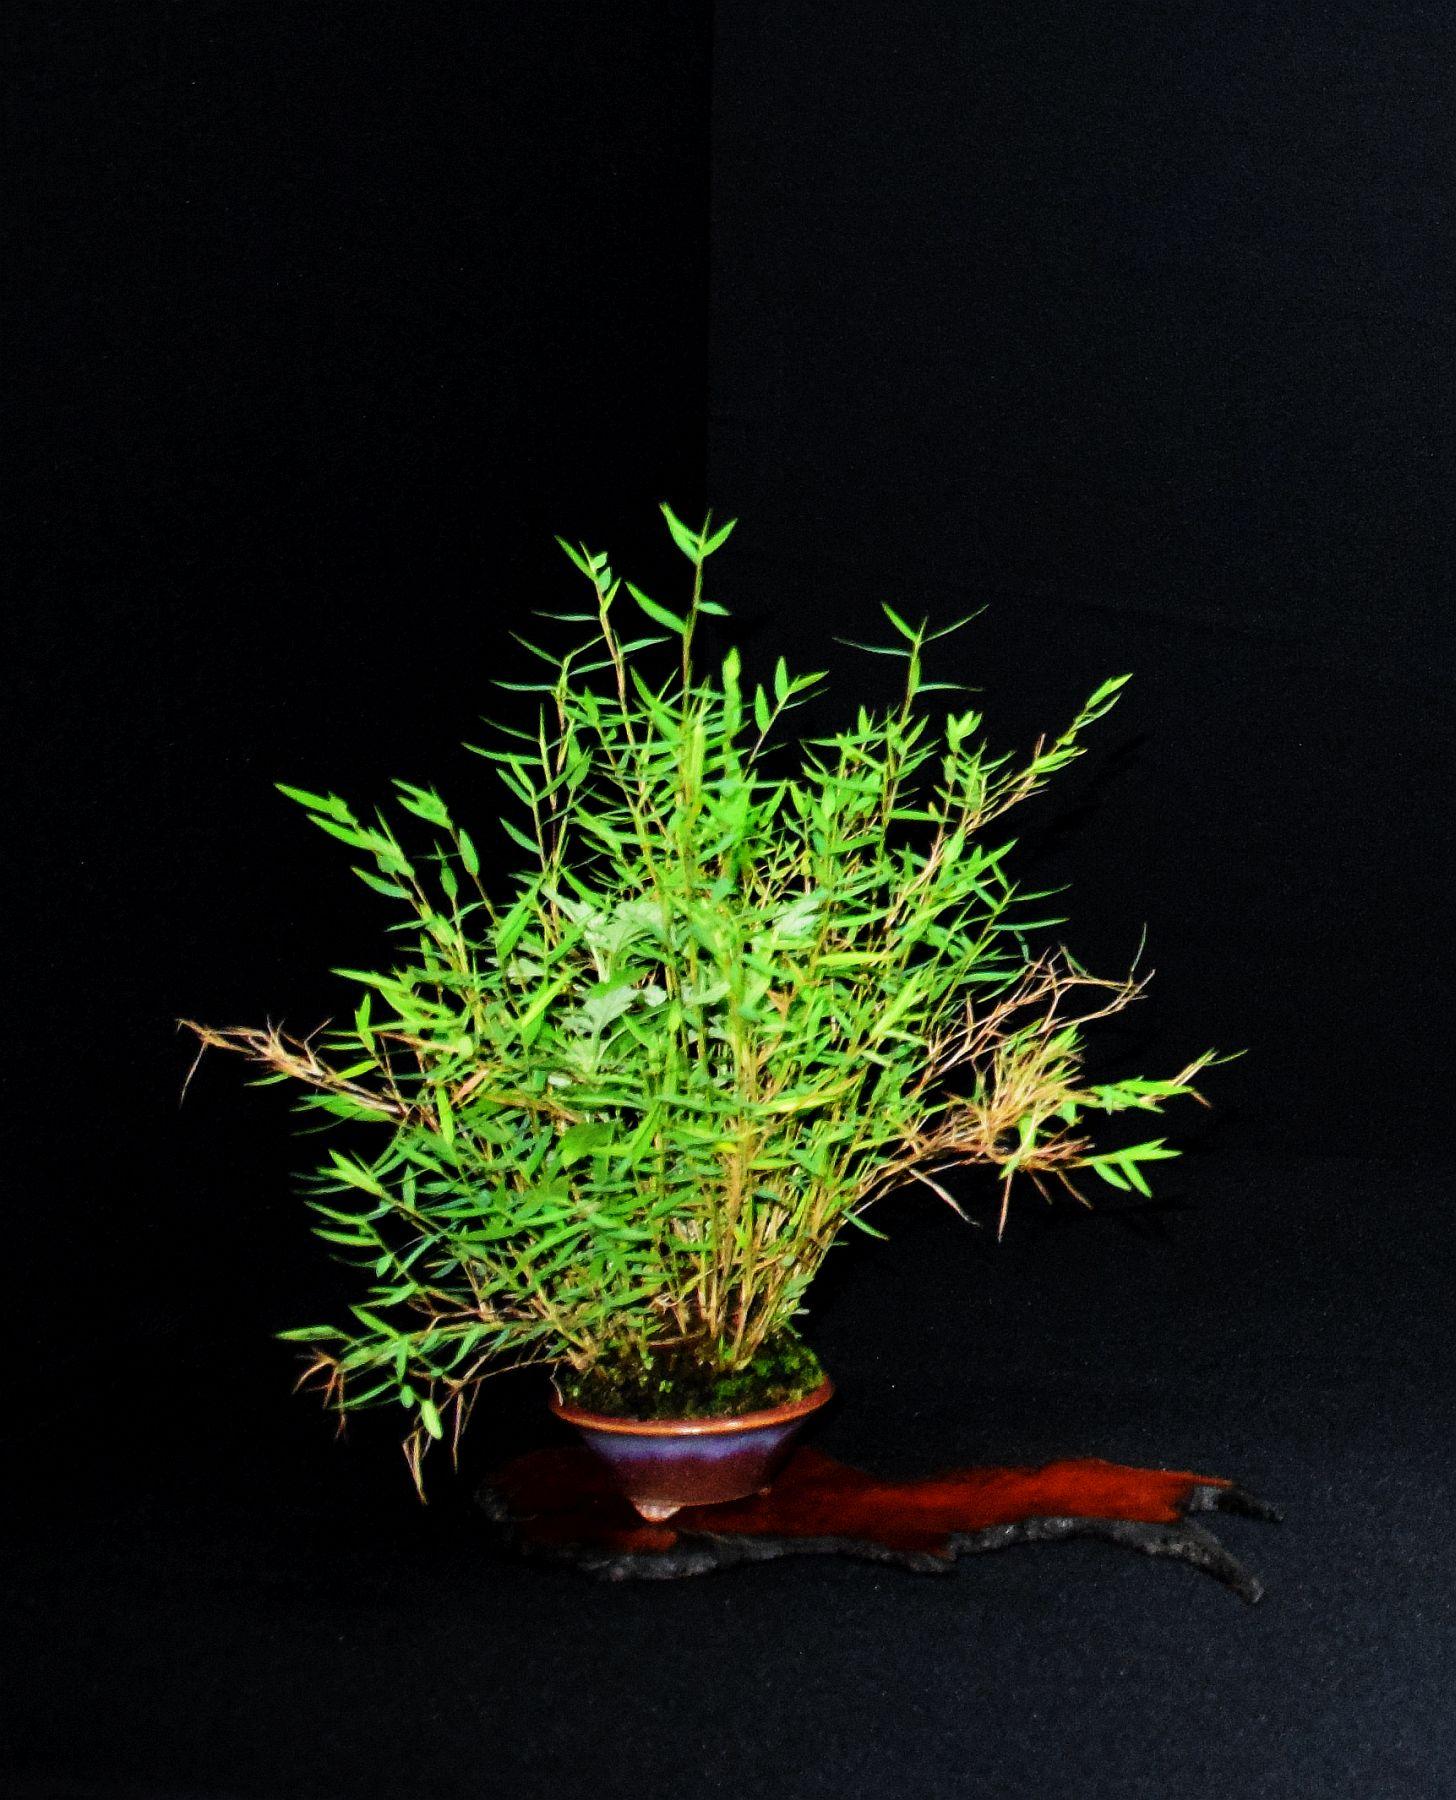 bonsai-museum-luis-vallejo-018